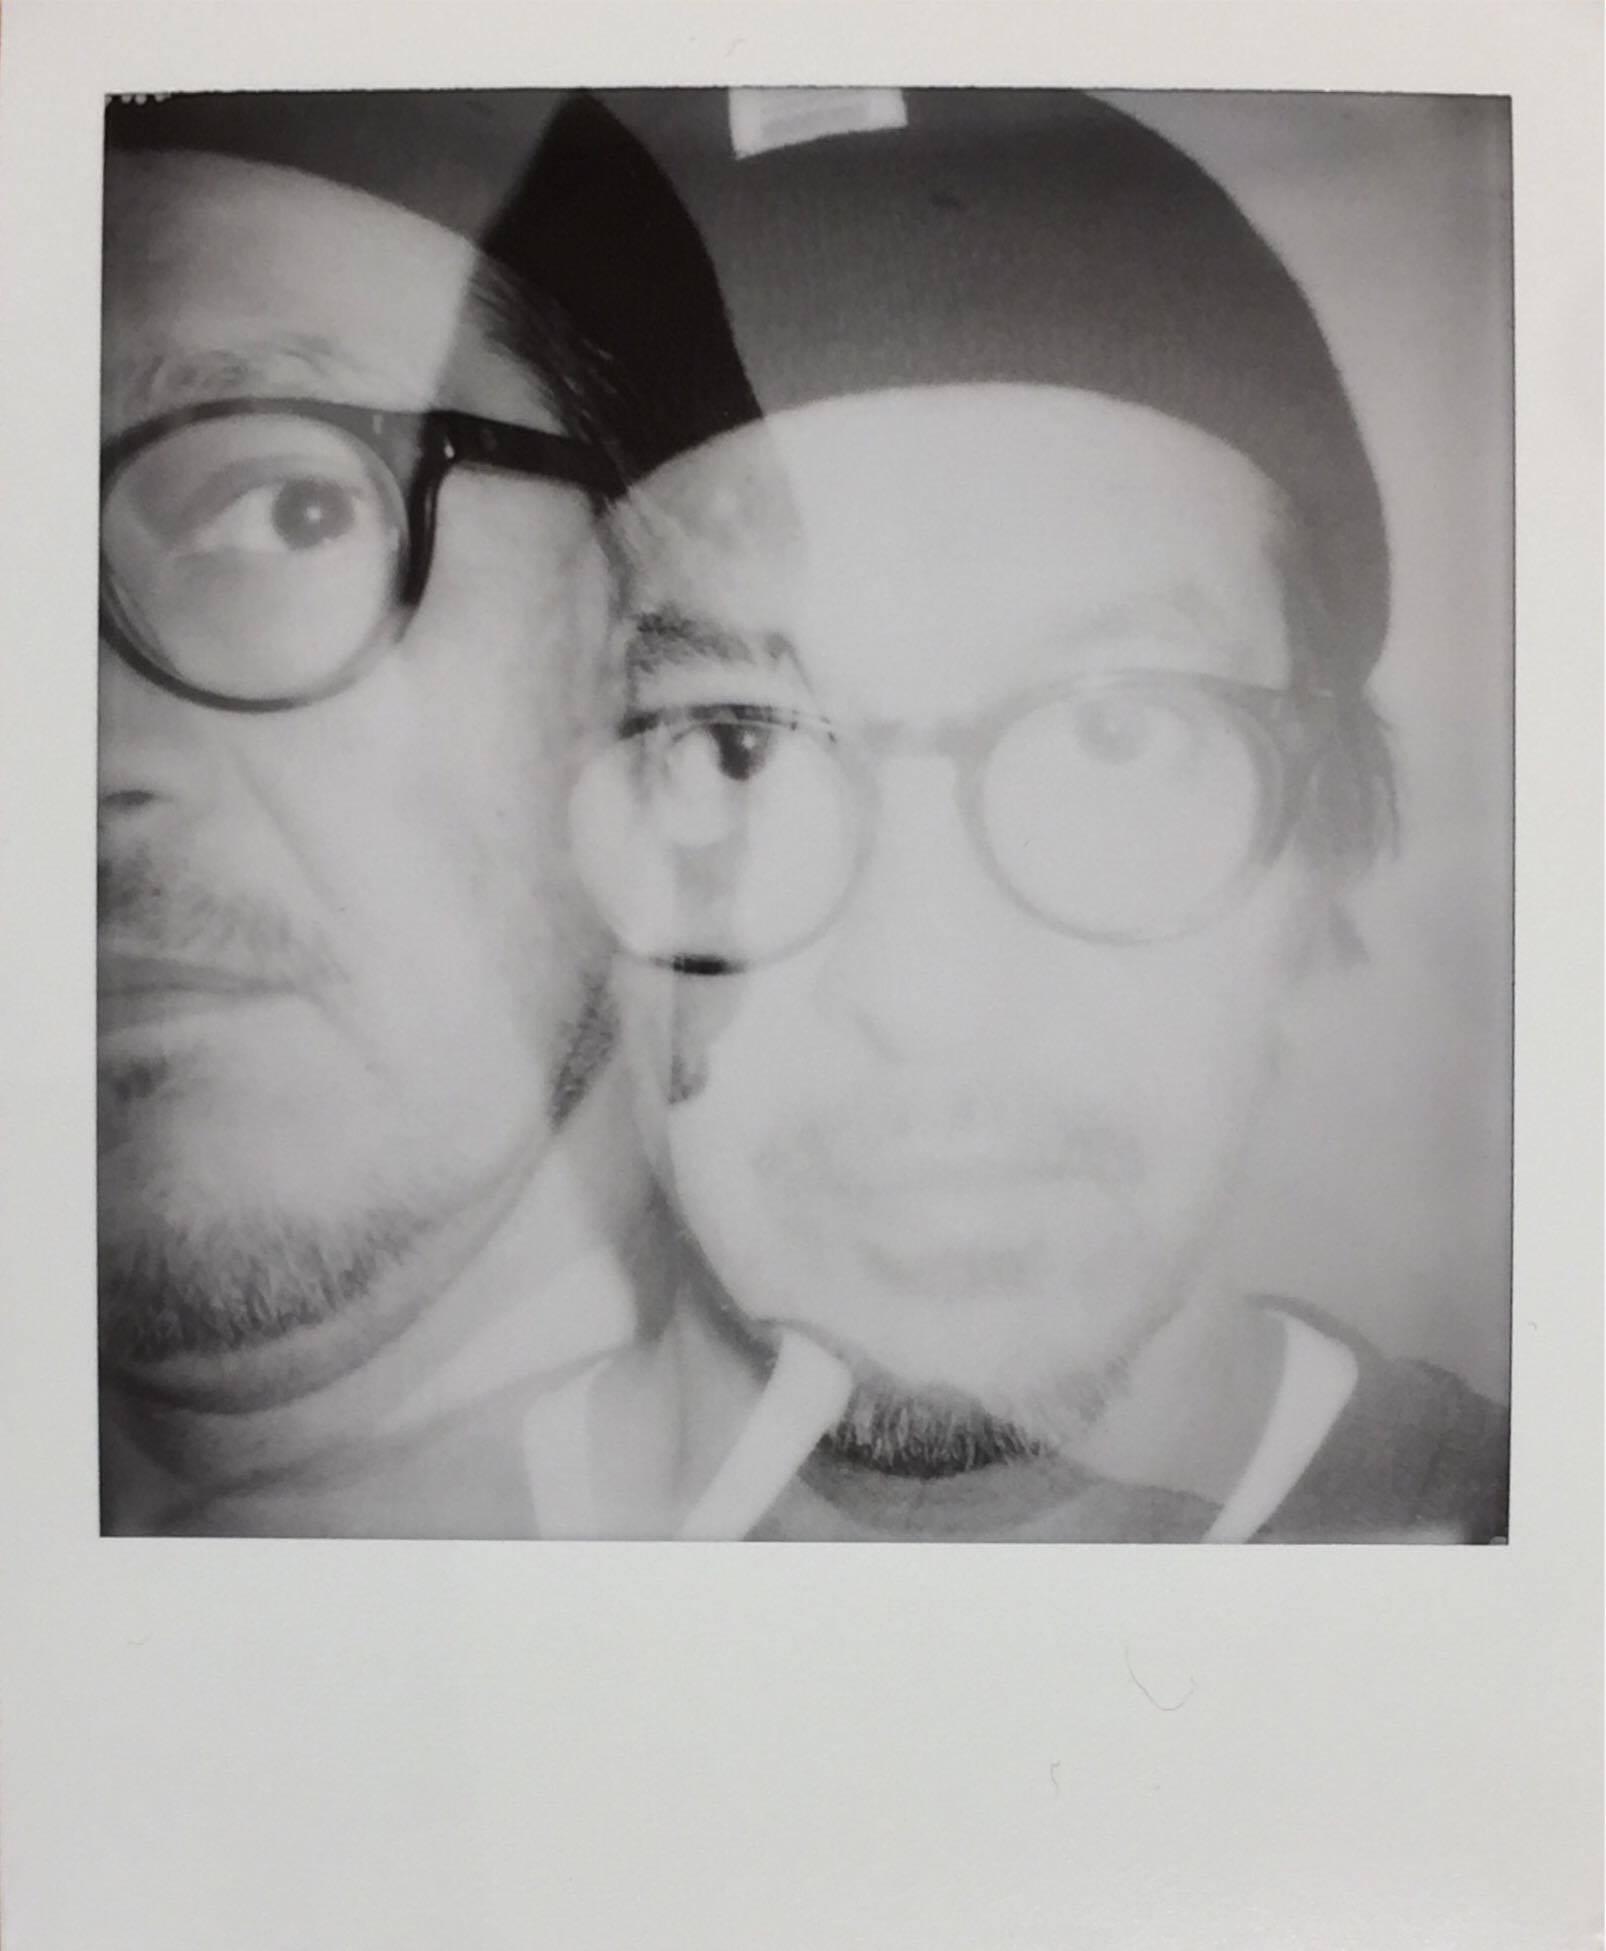 Polaroid radionica / Dupla ekspozicija